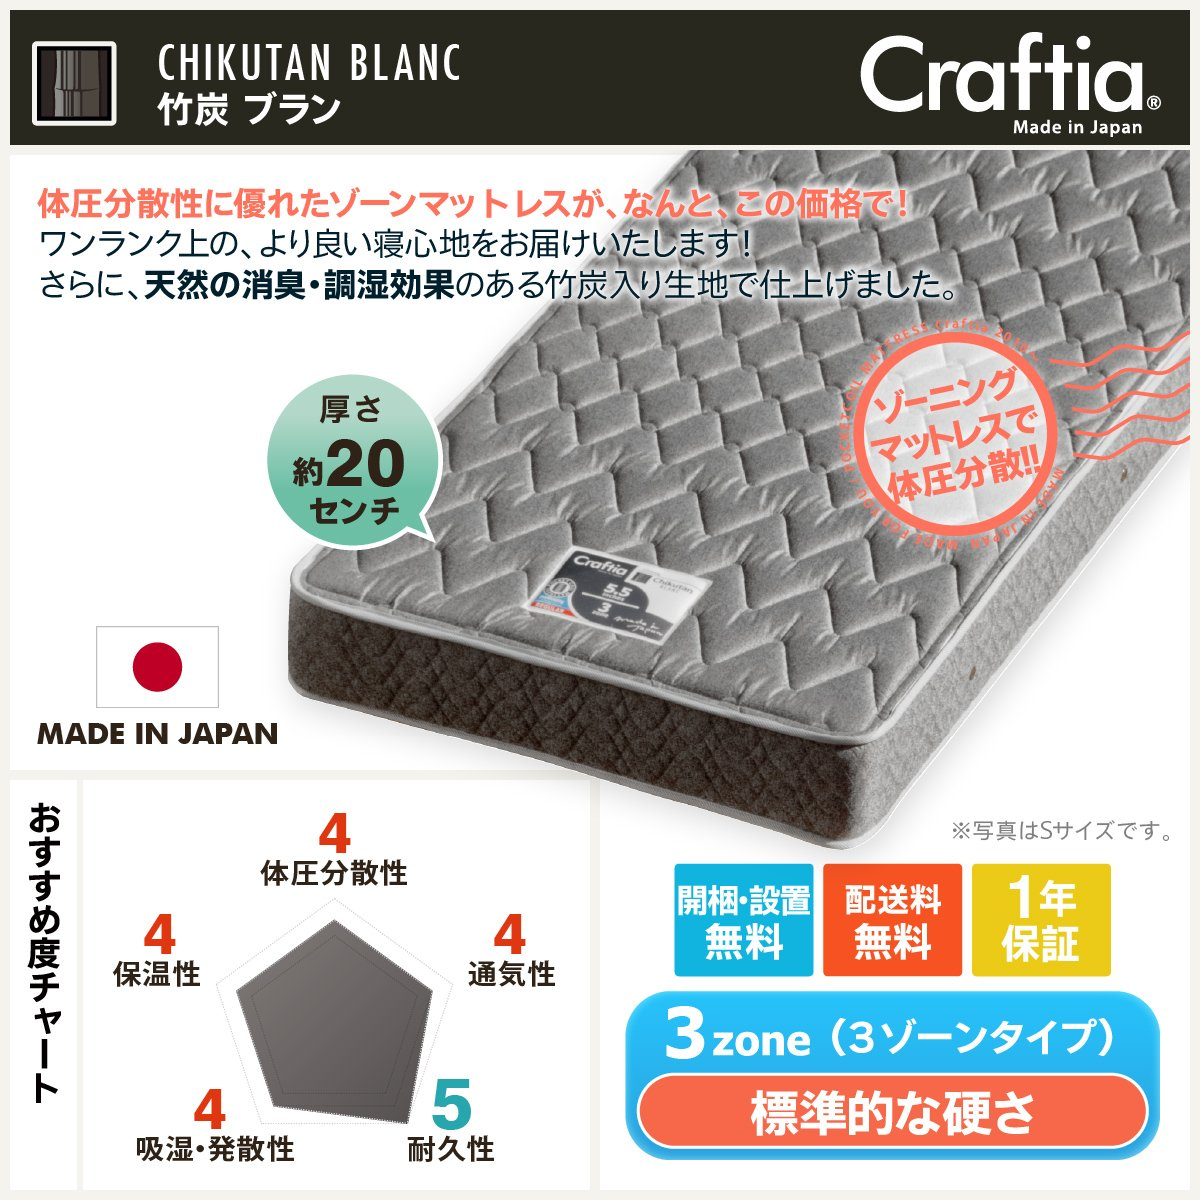 Craftia 日本製 ポケットコイルマットレス 竹炭ブラン ワイドダブル B007TGBZ1Q [6] WD(ワイドダブル)幅152×奥行195×高さ20cm [6] WD(ワイドダブル)幅152×奥行195×高さ20cm